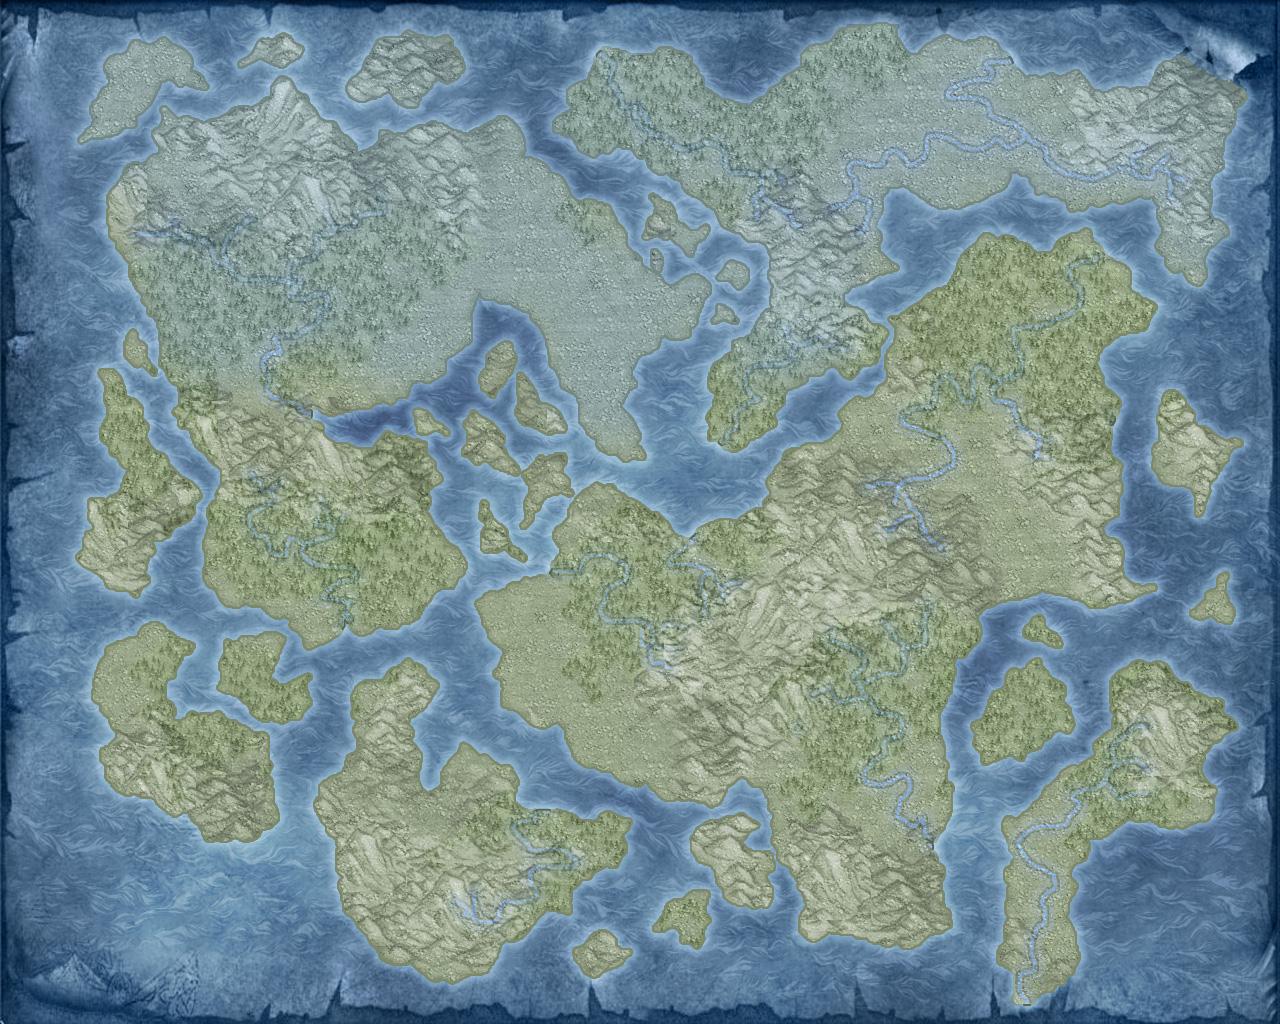 unlabeled fantasy world map Blank World Map 1 By Thedasscholar On Deviantart